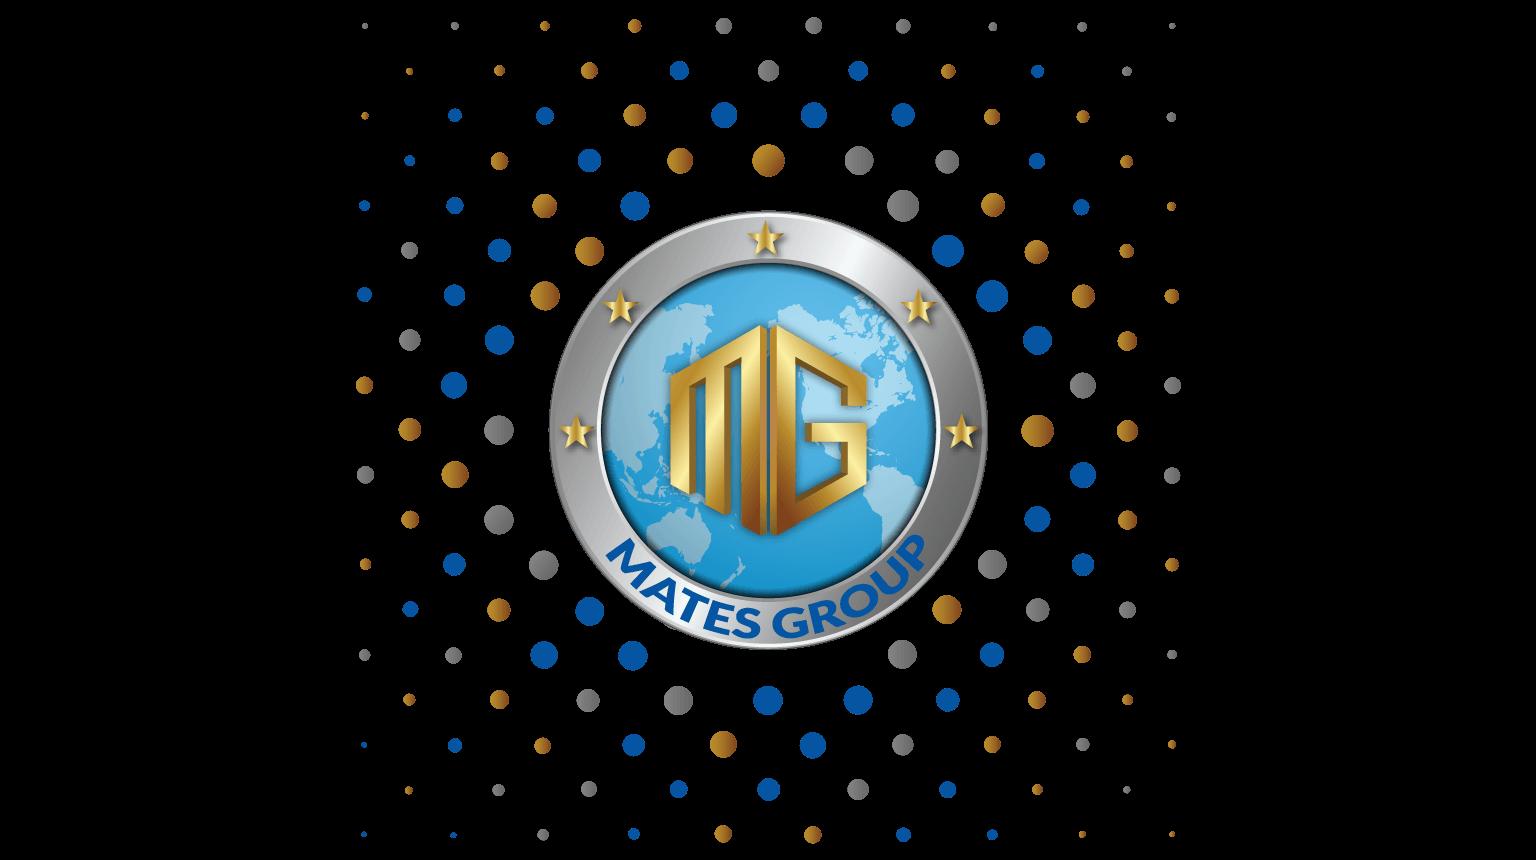 MATES GROUP logo